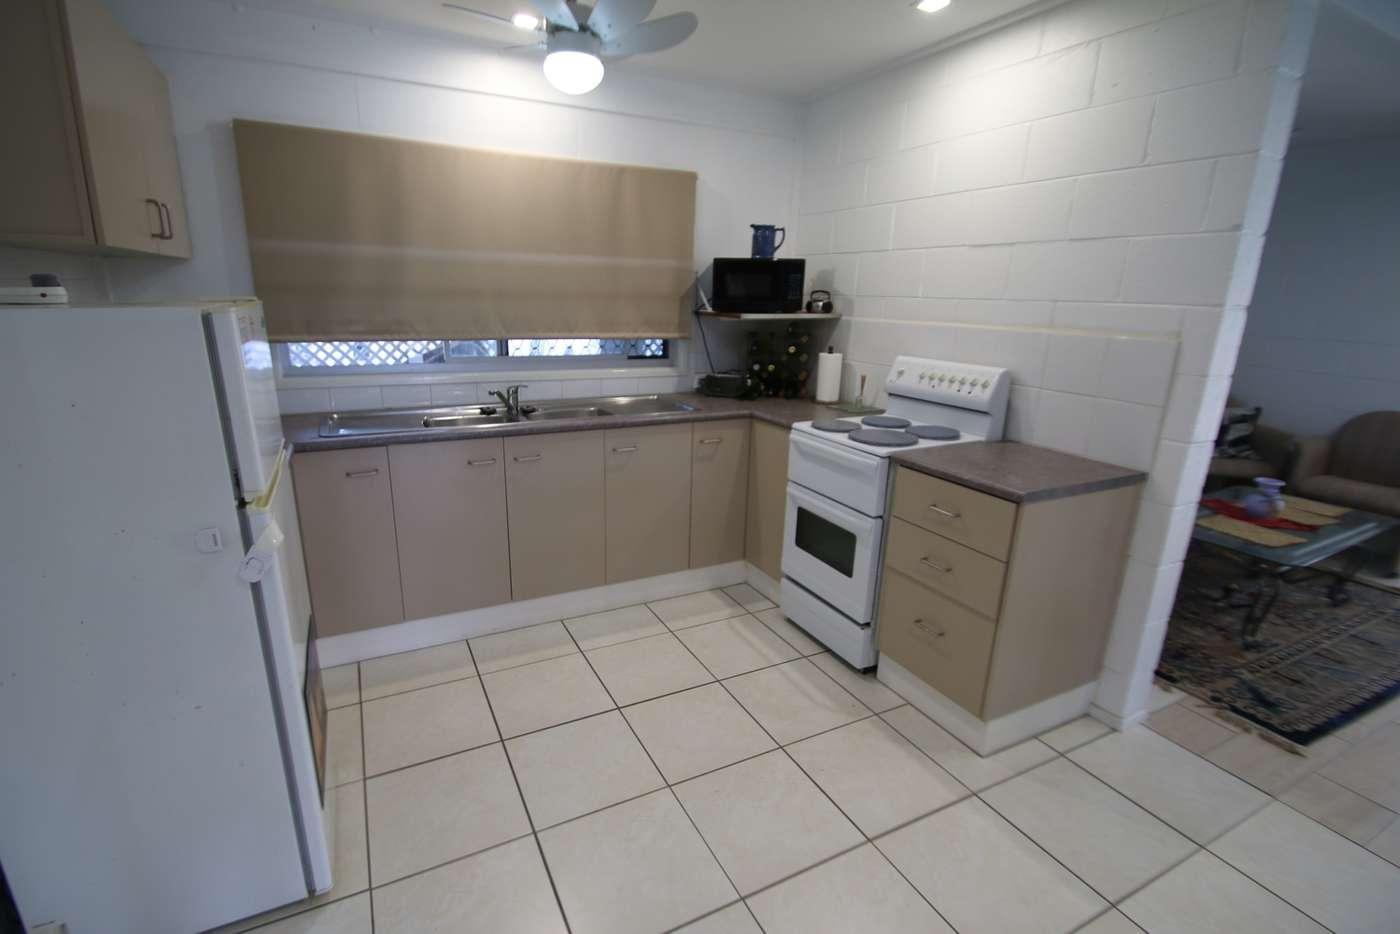 Seventh view of Homely unit listing, 2 Gull Street, Woorim QLD 4507